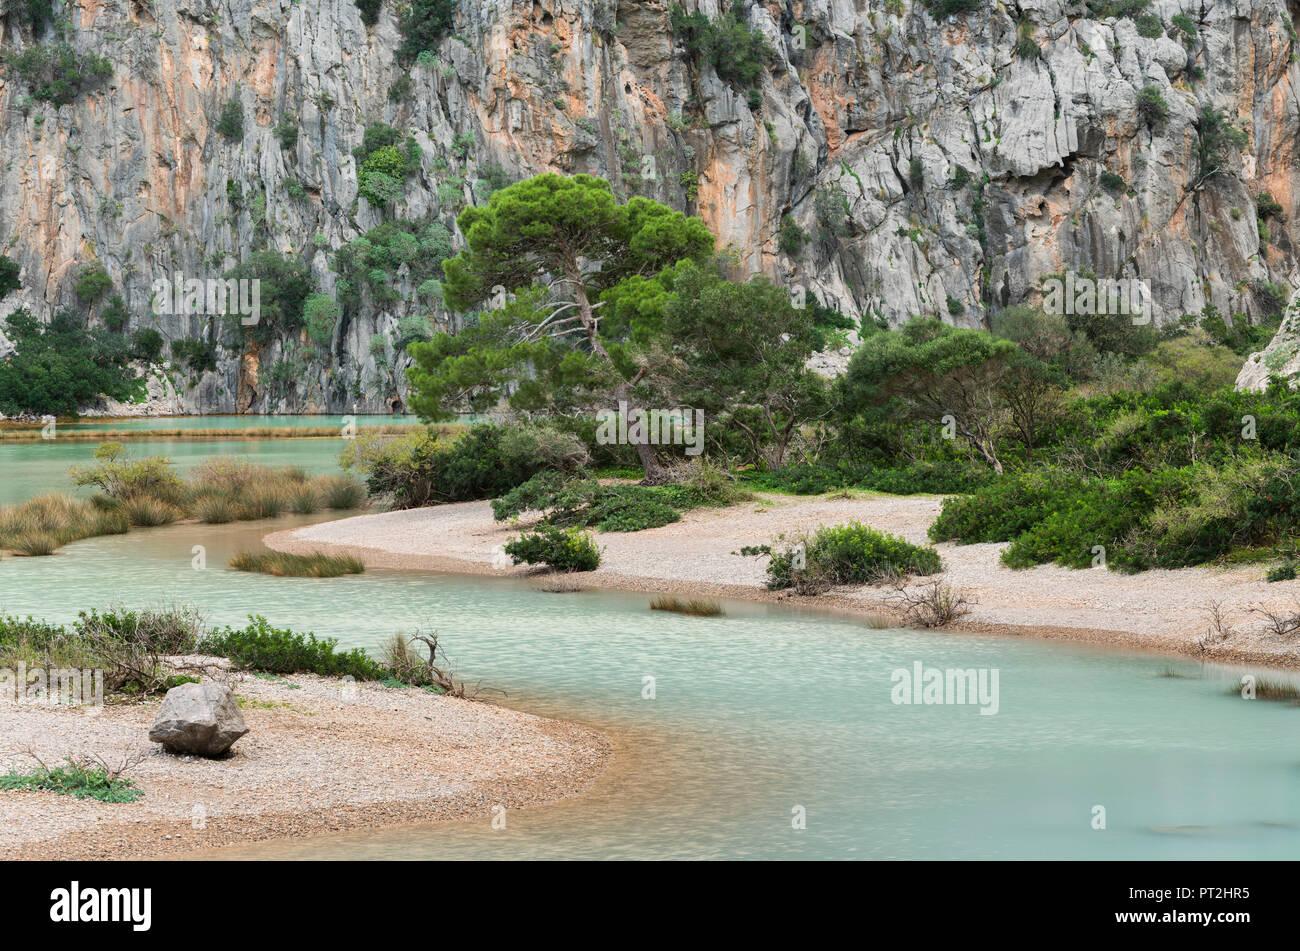 Torrent de Pareis, Sa Calobra, Tramuntana, Mallorca, Balearic Islands, Spain - Stock Image